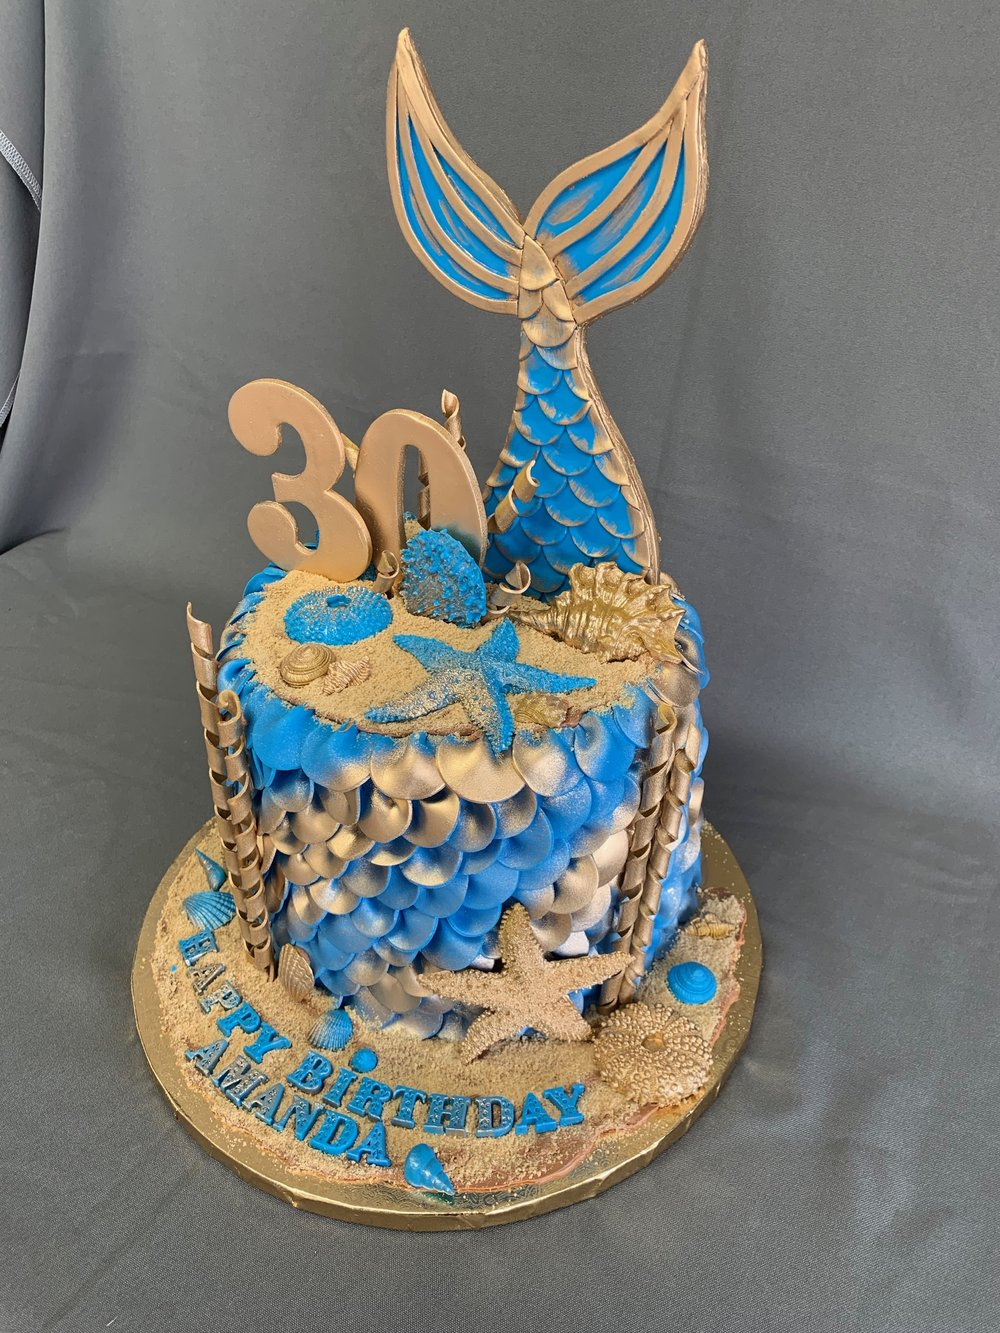 Meraid themed birthday cake NJ